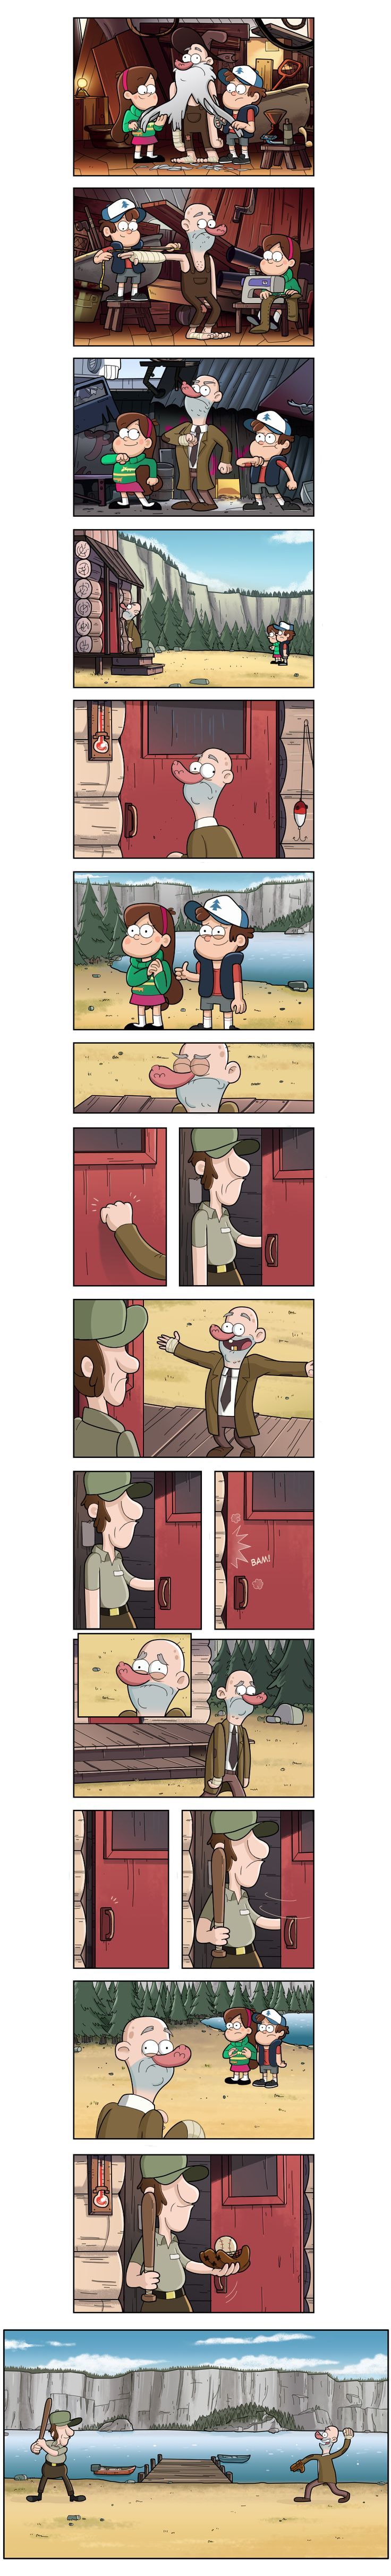 30 years by markmak on deviantART. Ah Meu Deus!!!!!!! Eu achei tão fofo a atitude de Mabel e Dipper e como o final termina...